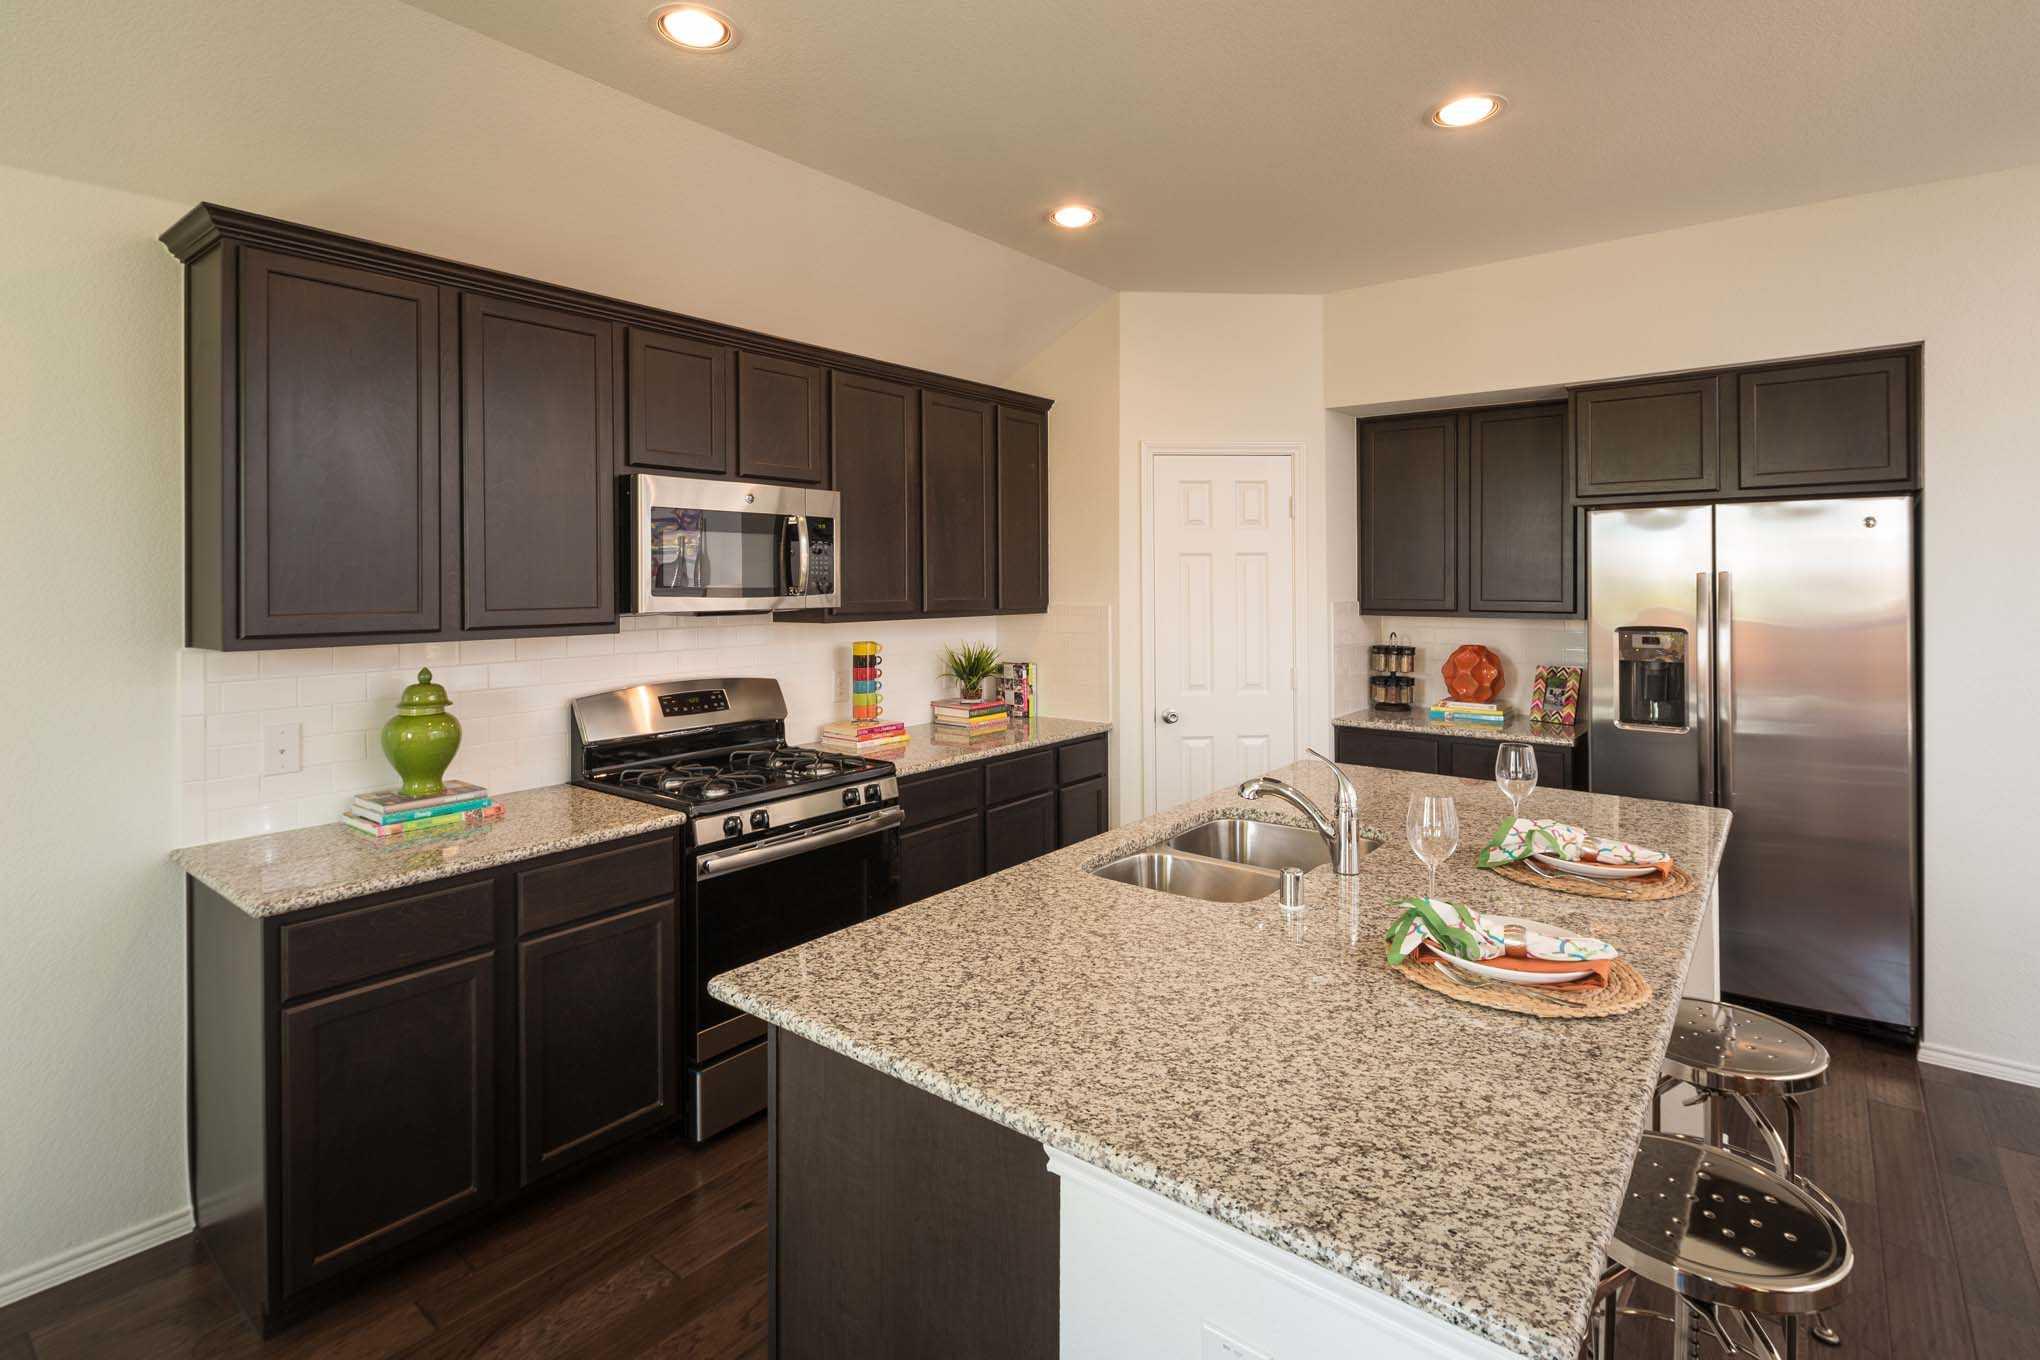 Representative Photo    Representative Photo. New Home Plan ASHW in Round Rock  TX 78665